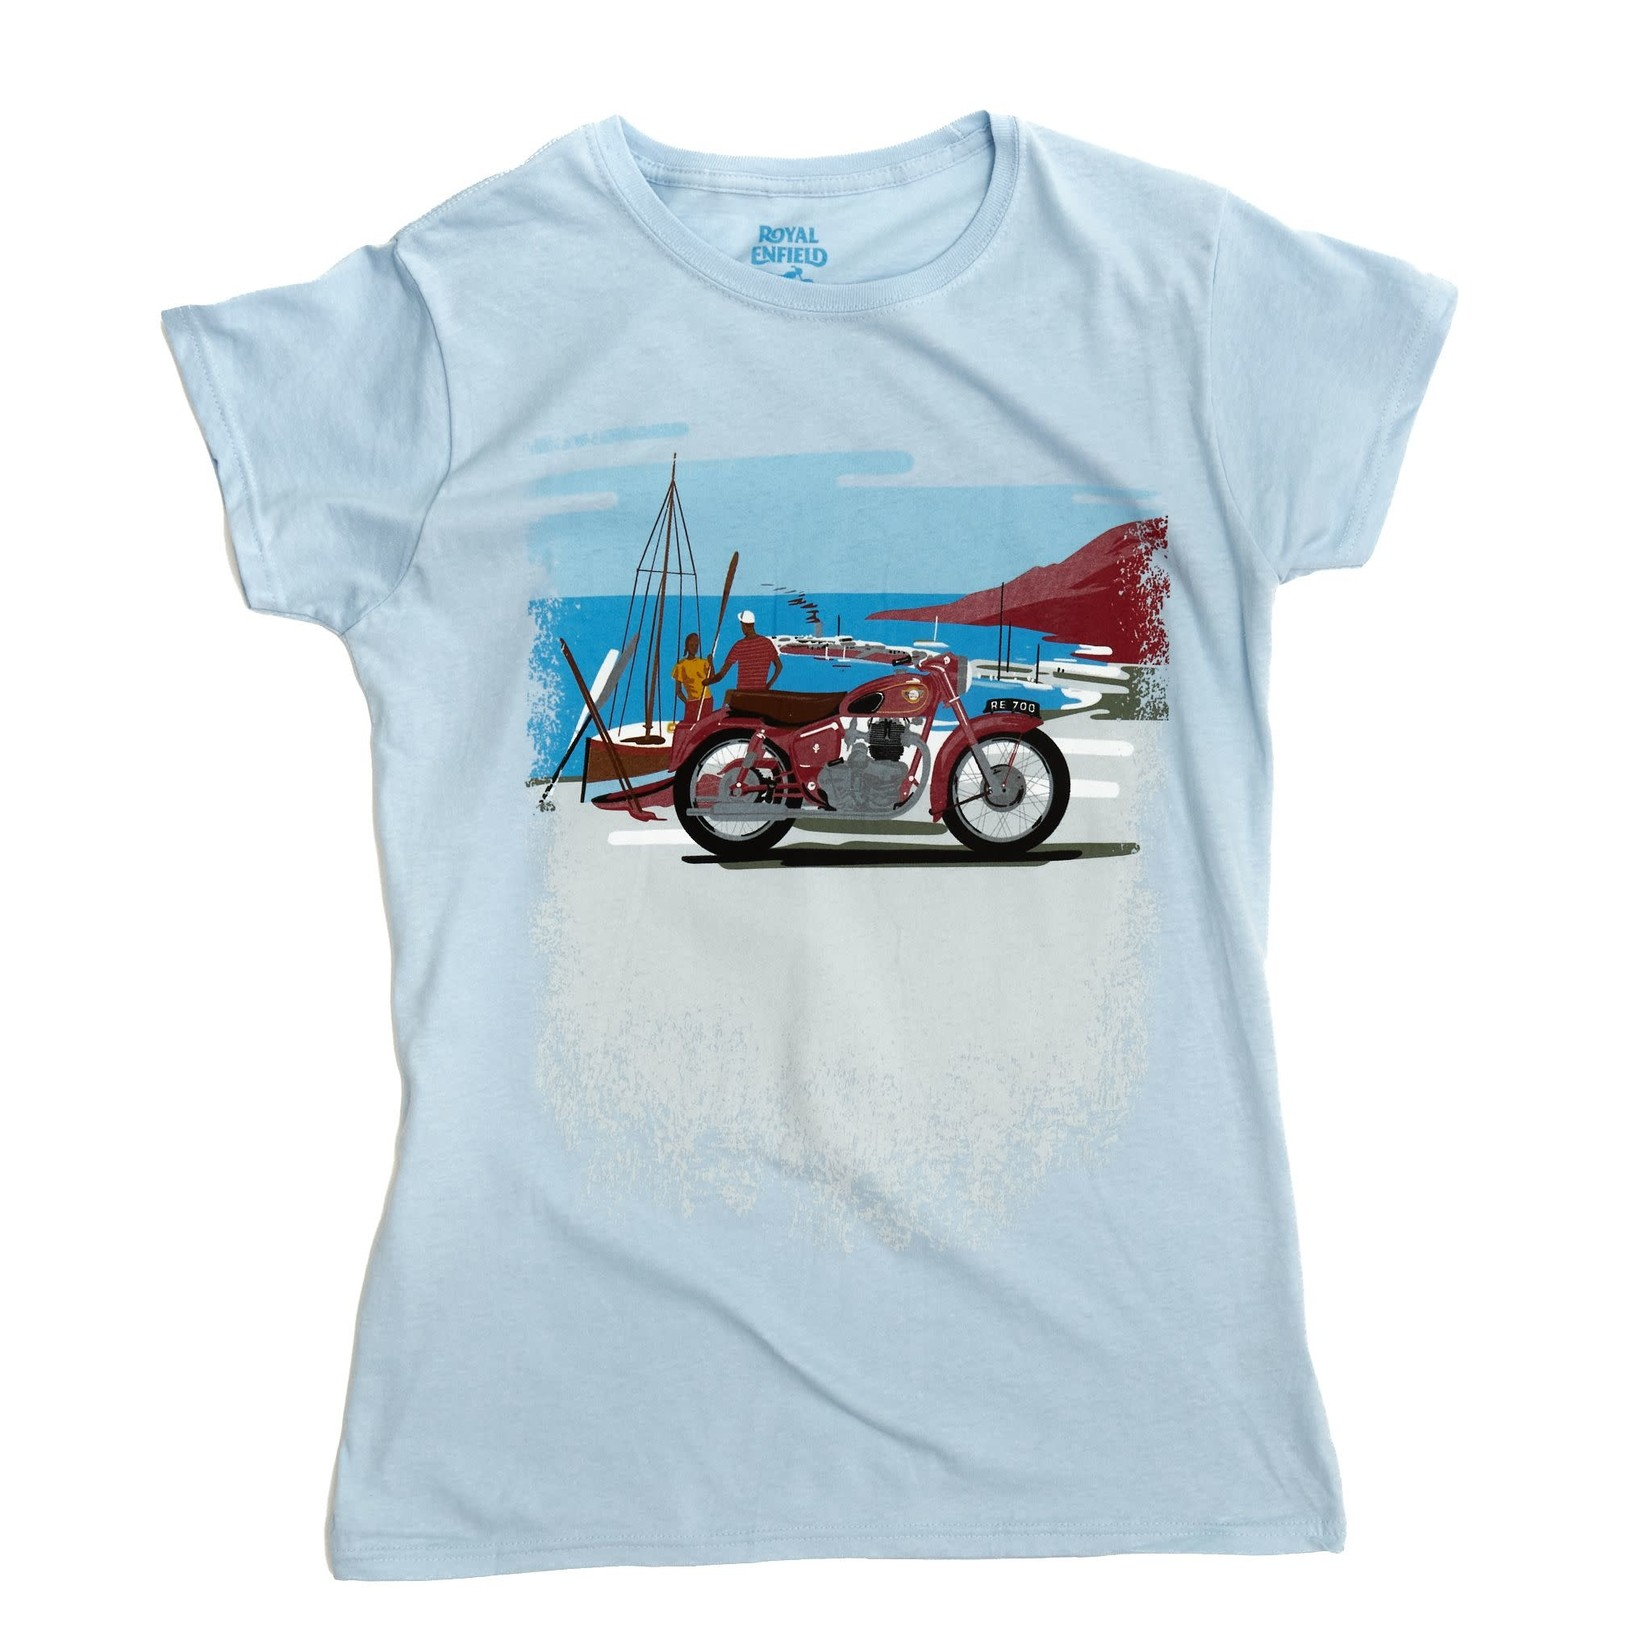 Royal Enfield Classic Sunset - RE shirt